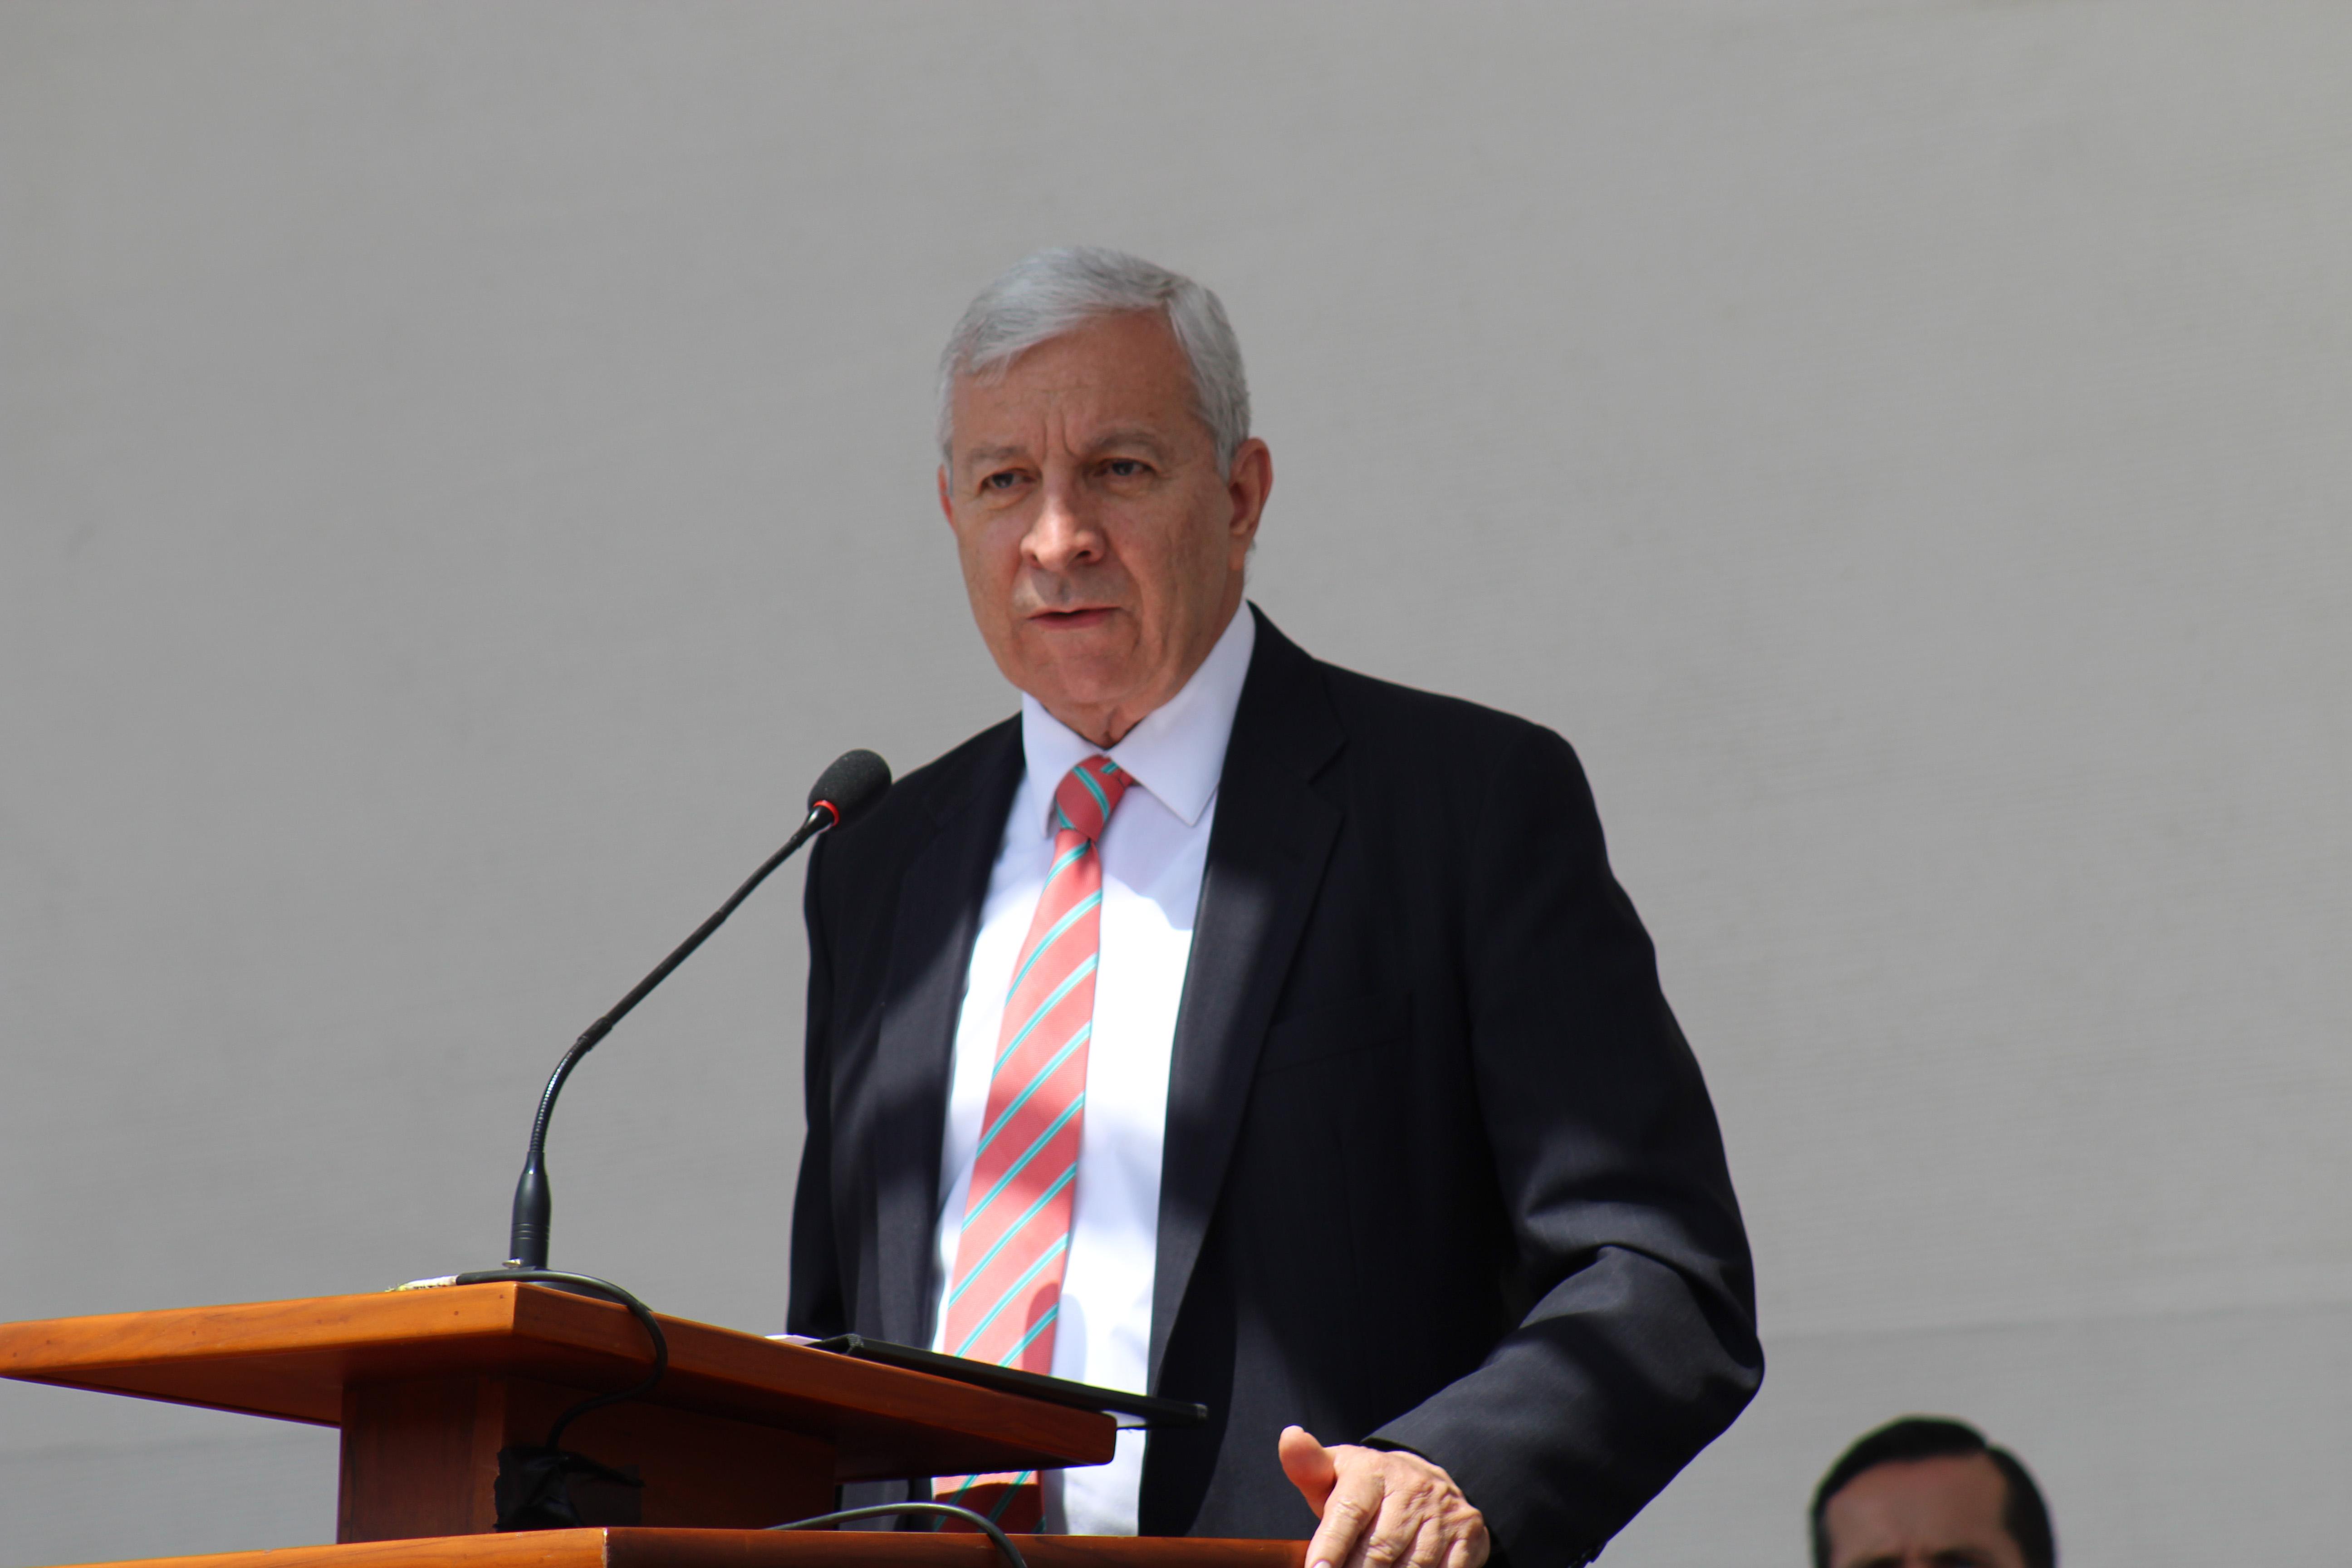 Elder Enrique R. Falabella speaks during the Quito Ecuador Temple groundbreaking on Saturday, May 11, 2019.